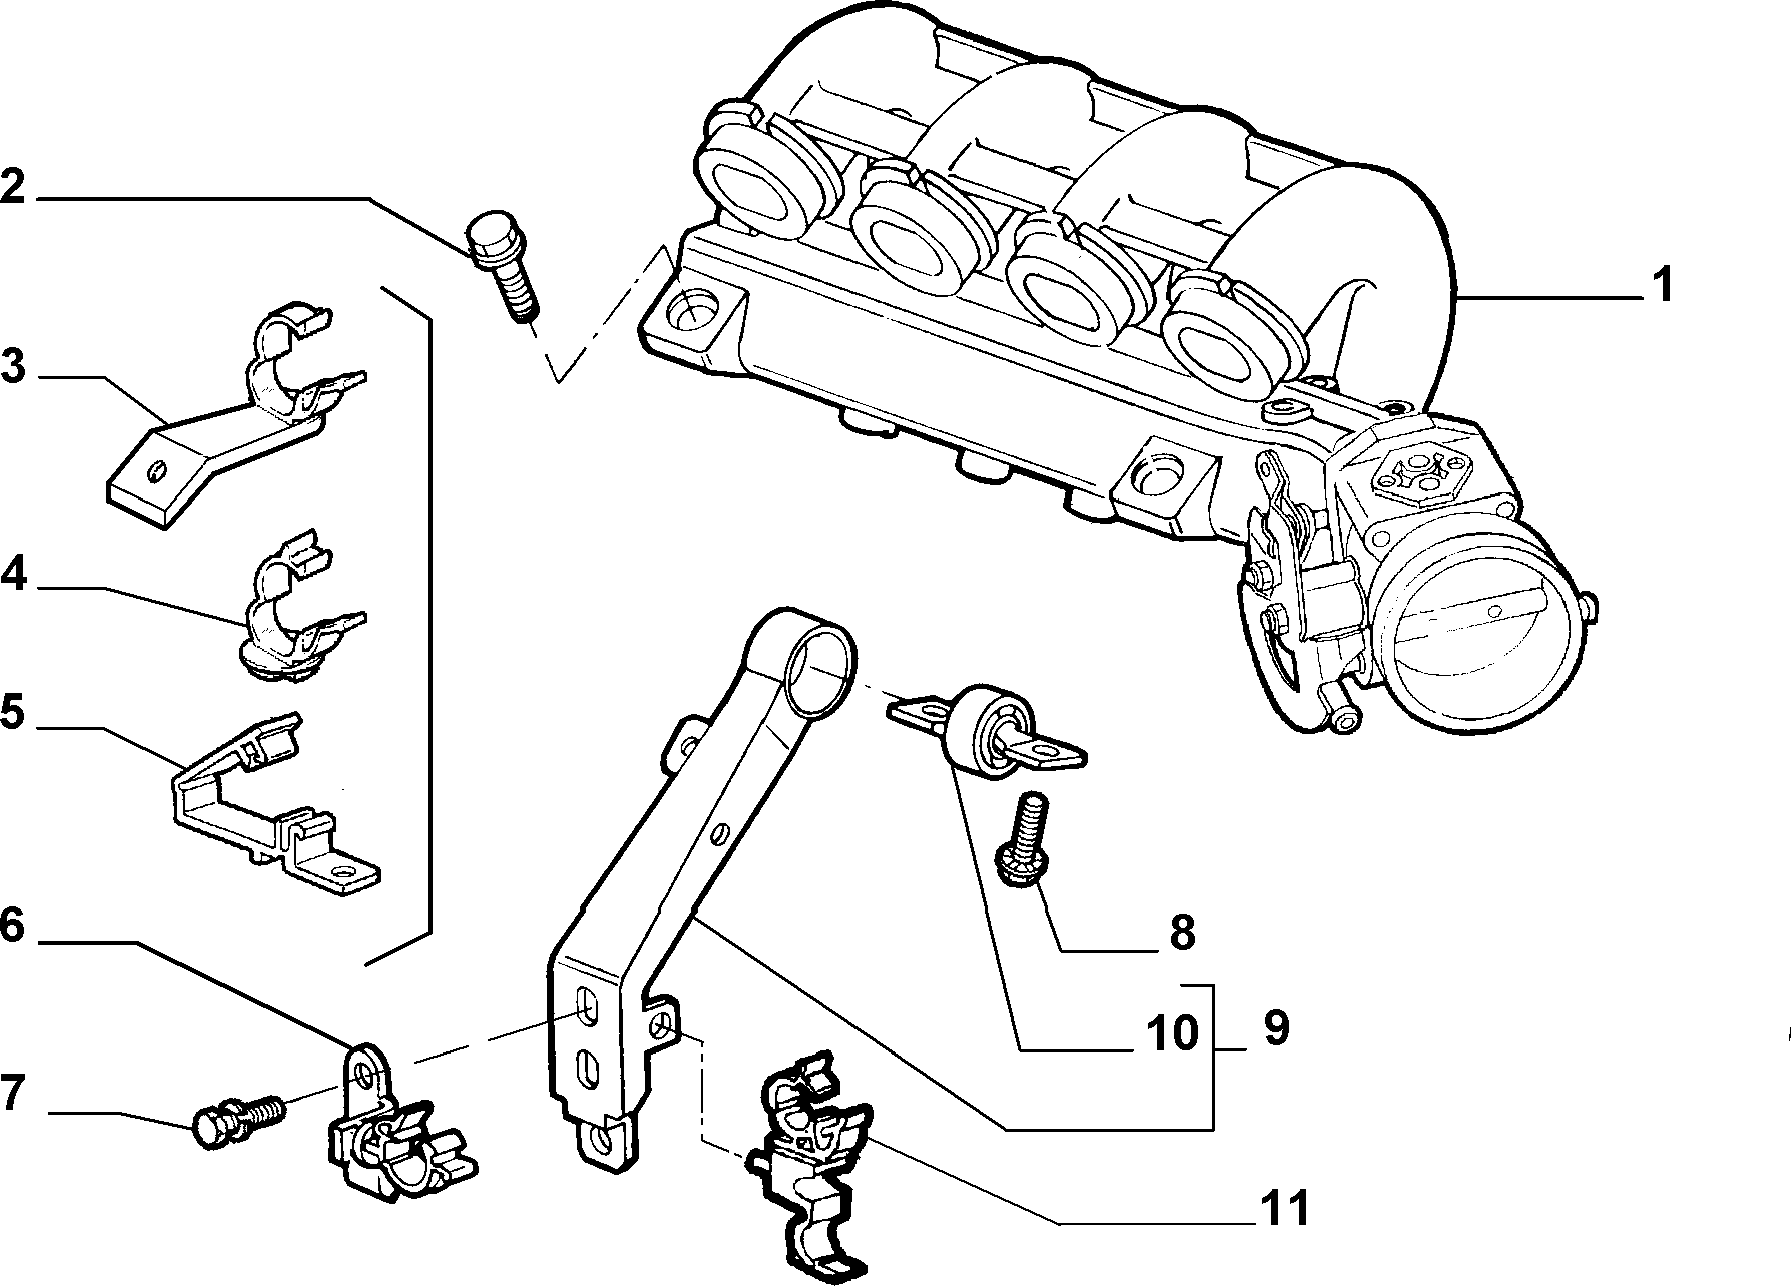 10255/10 ВСАСЫВАЮЩИЙ КАНАЛ